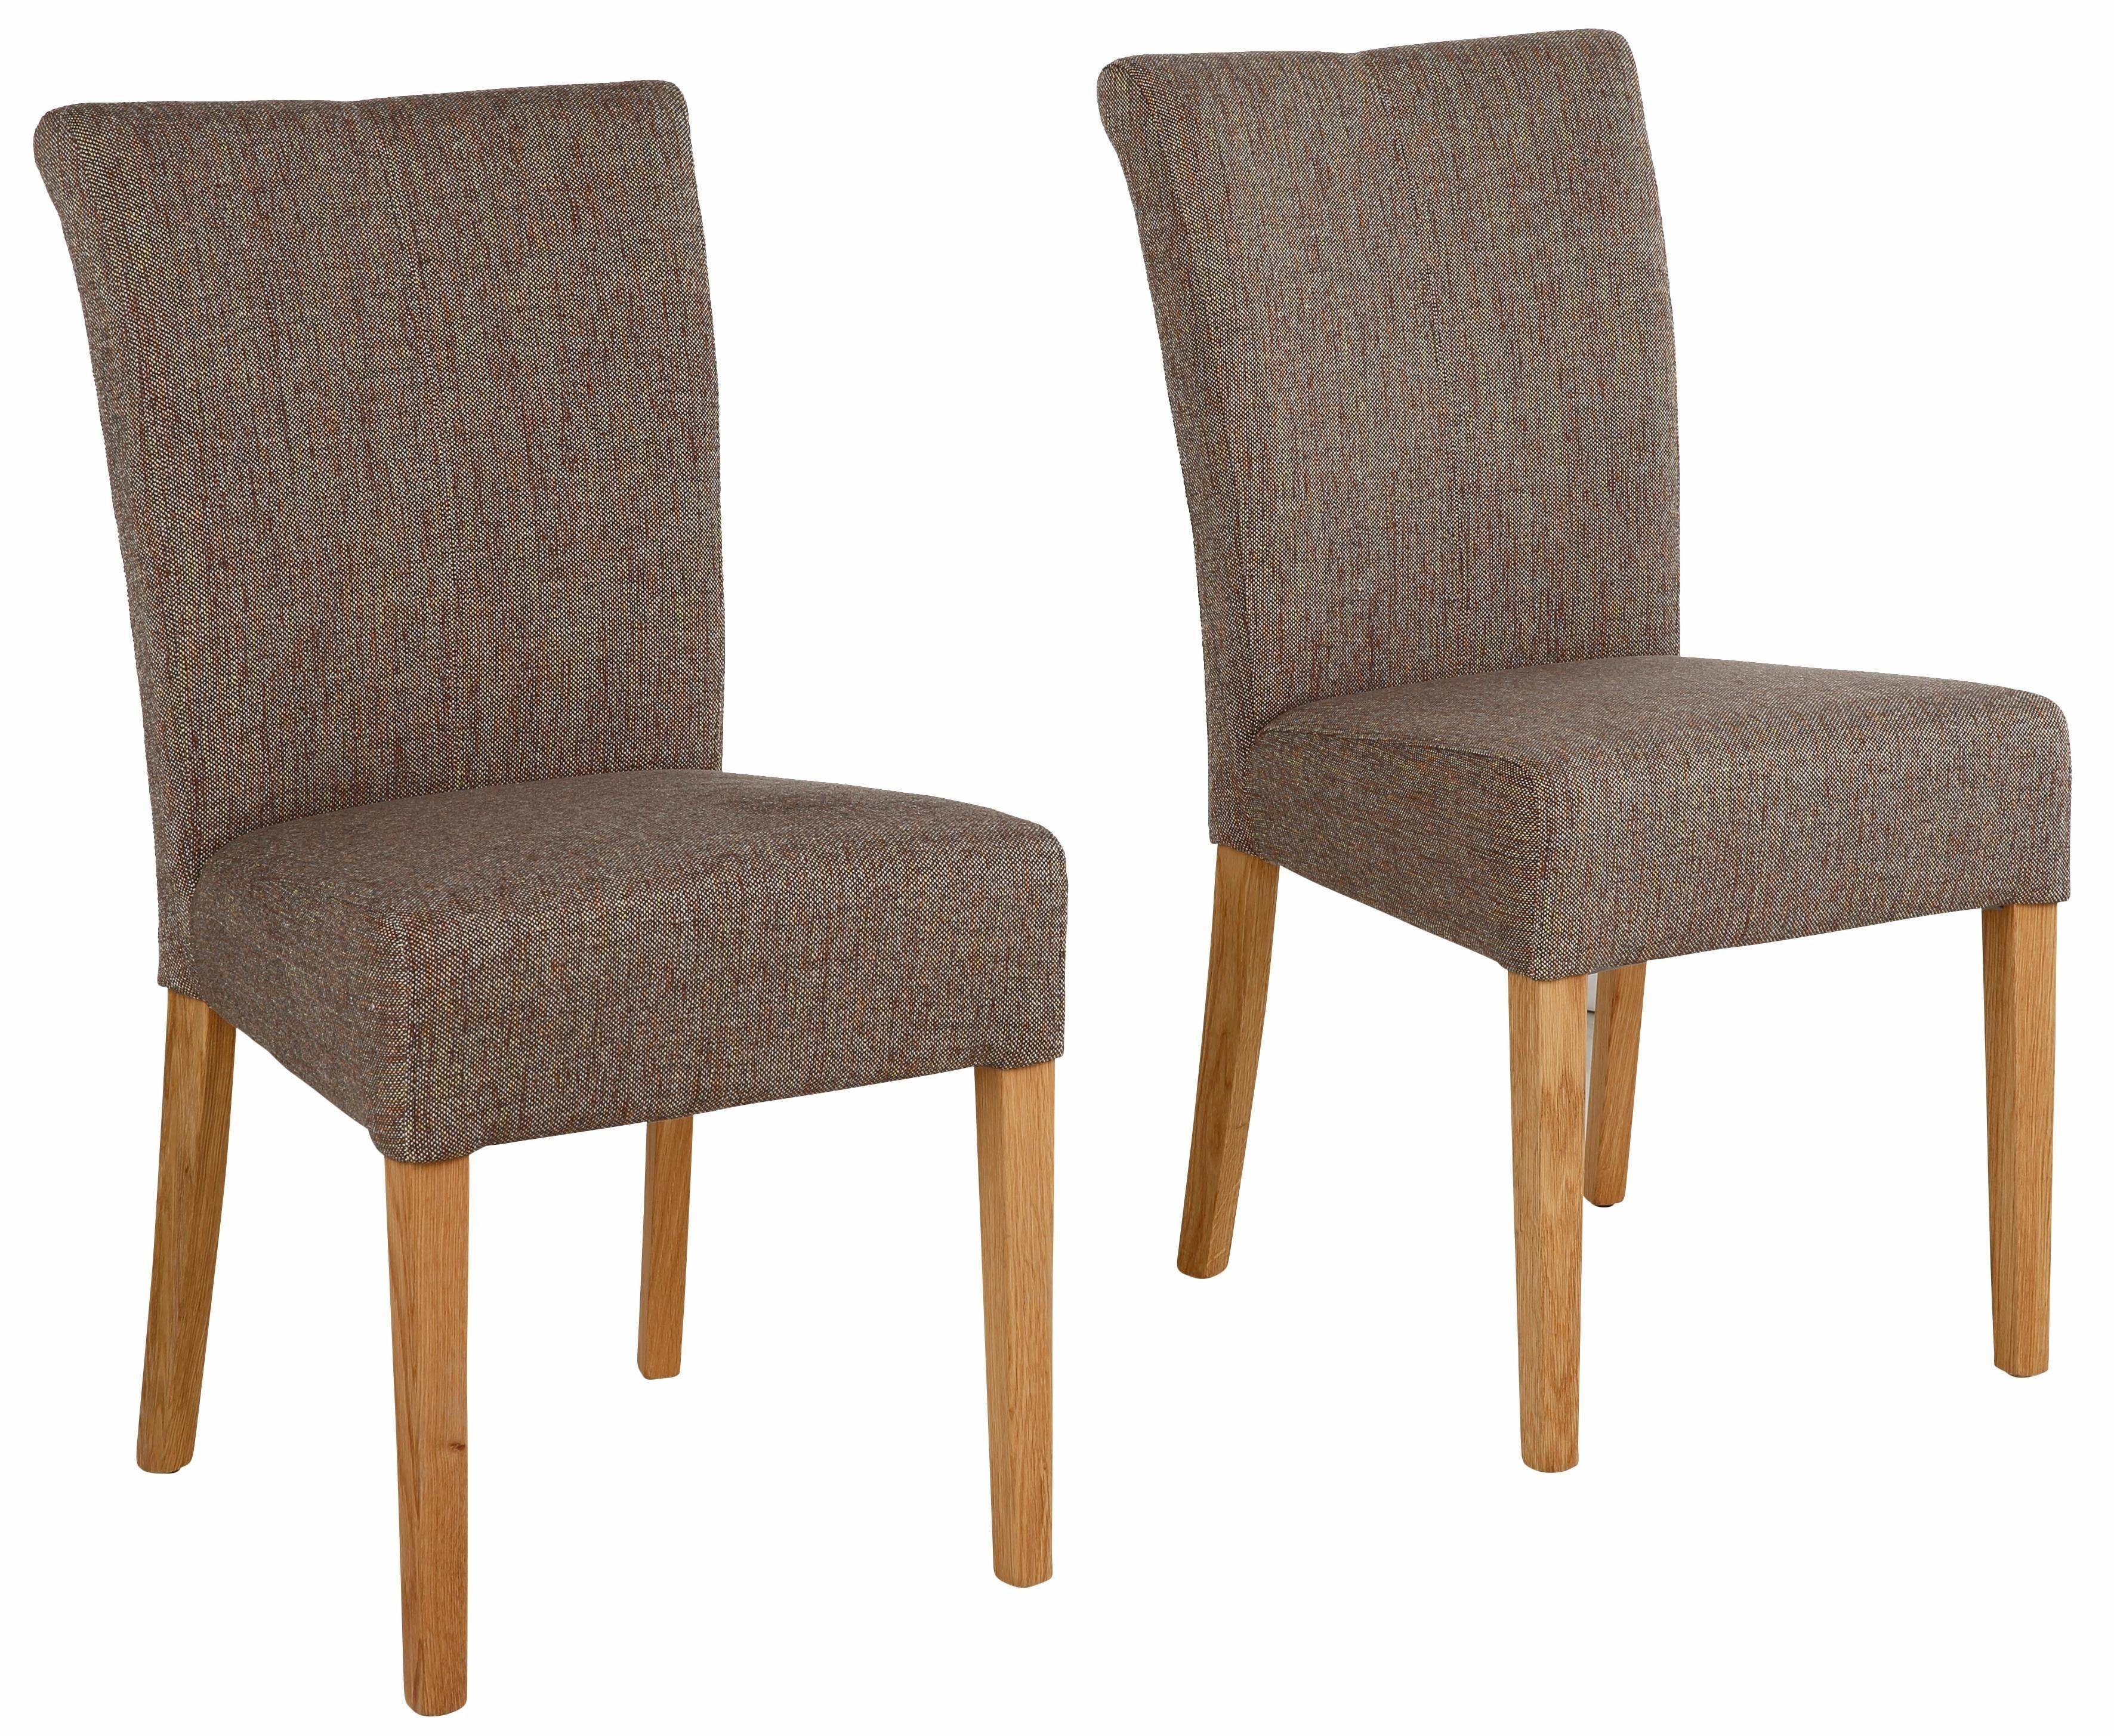 Home Affaire Stuhl Braun Luxus Microfaser In Lederoptik Queen Fsc Zertifiziert Jetzt Bestellen Unter Https Moebel Laden Polsterstuhl Holzstuhle Stuhle